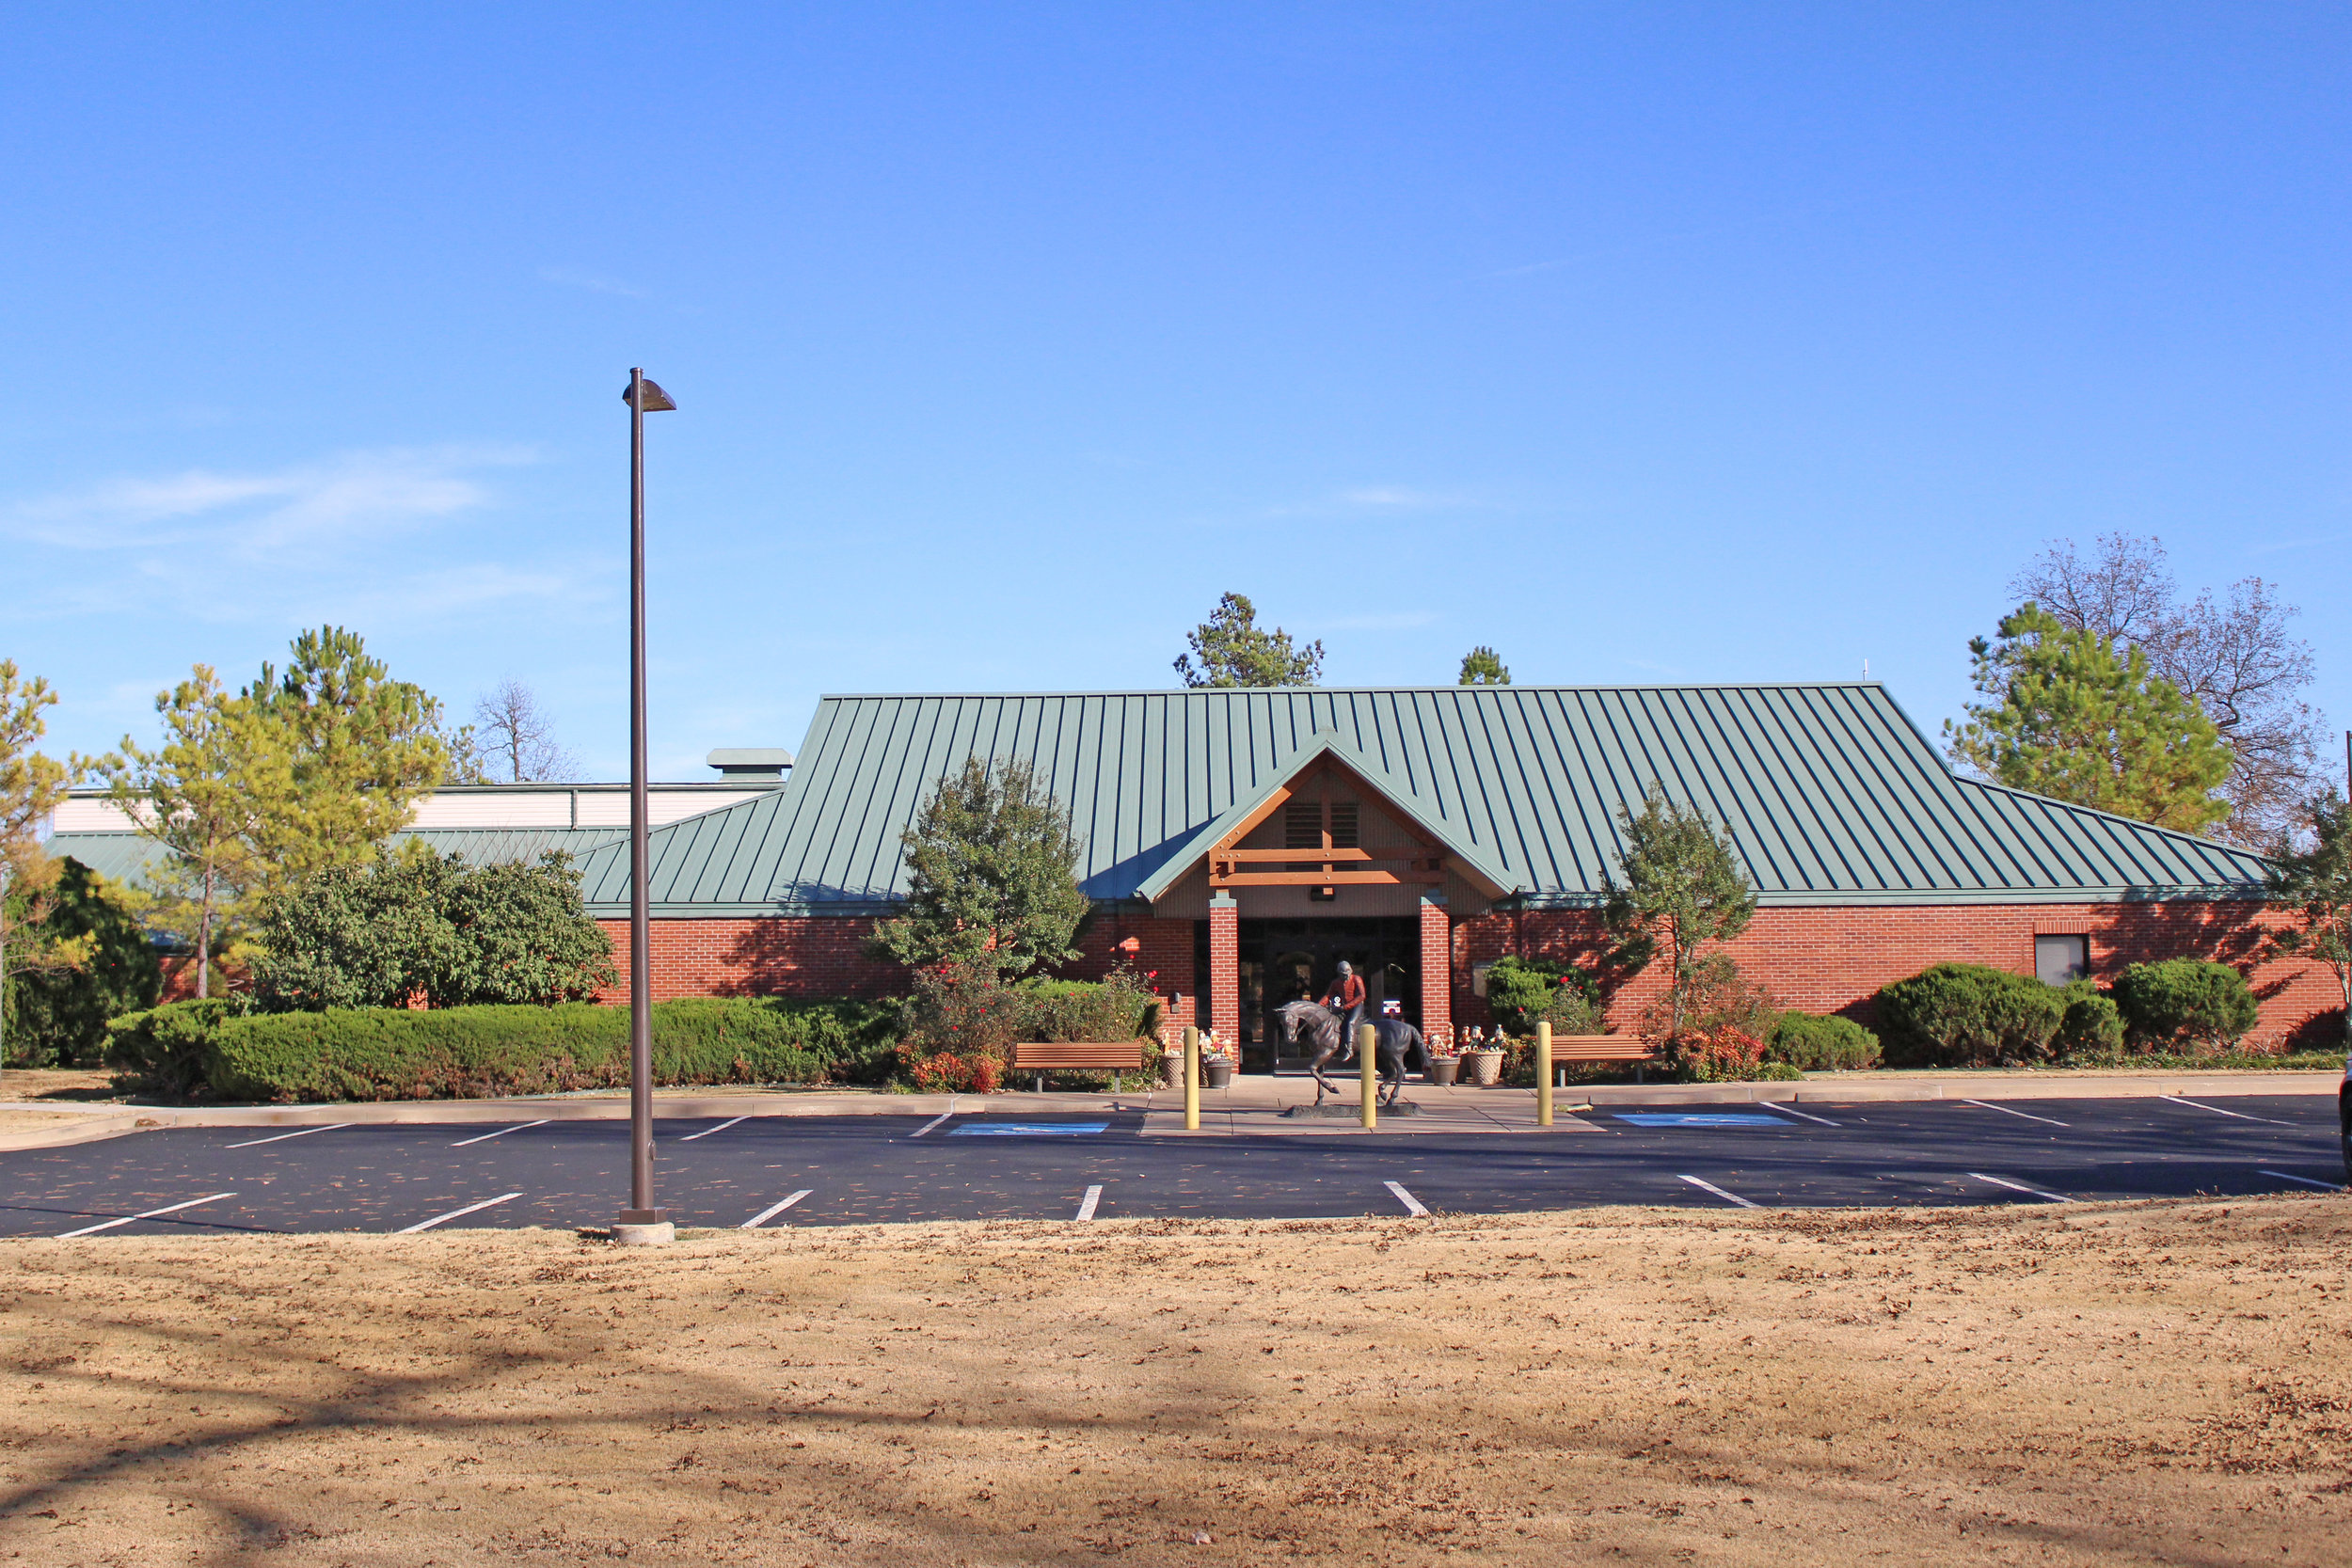 Tulsa Boys Home 171119 (Scott Emigh).JPG